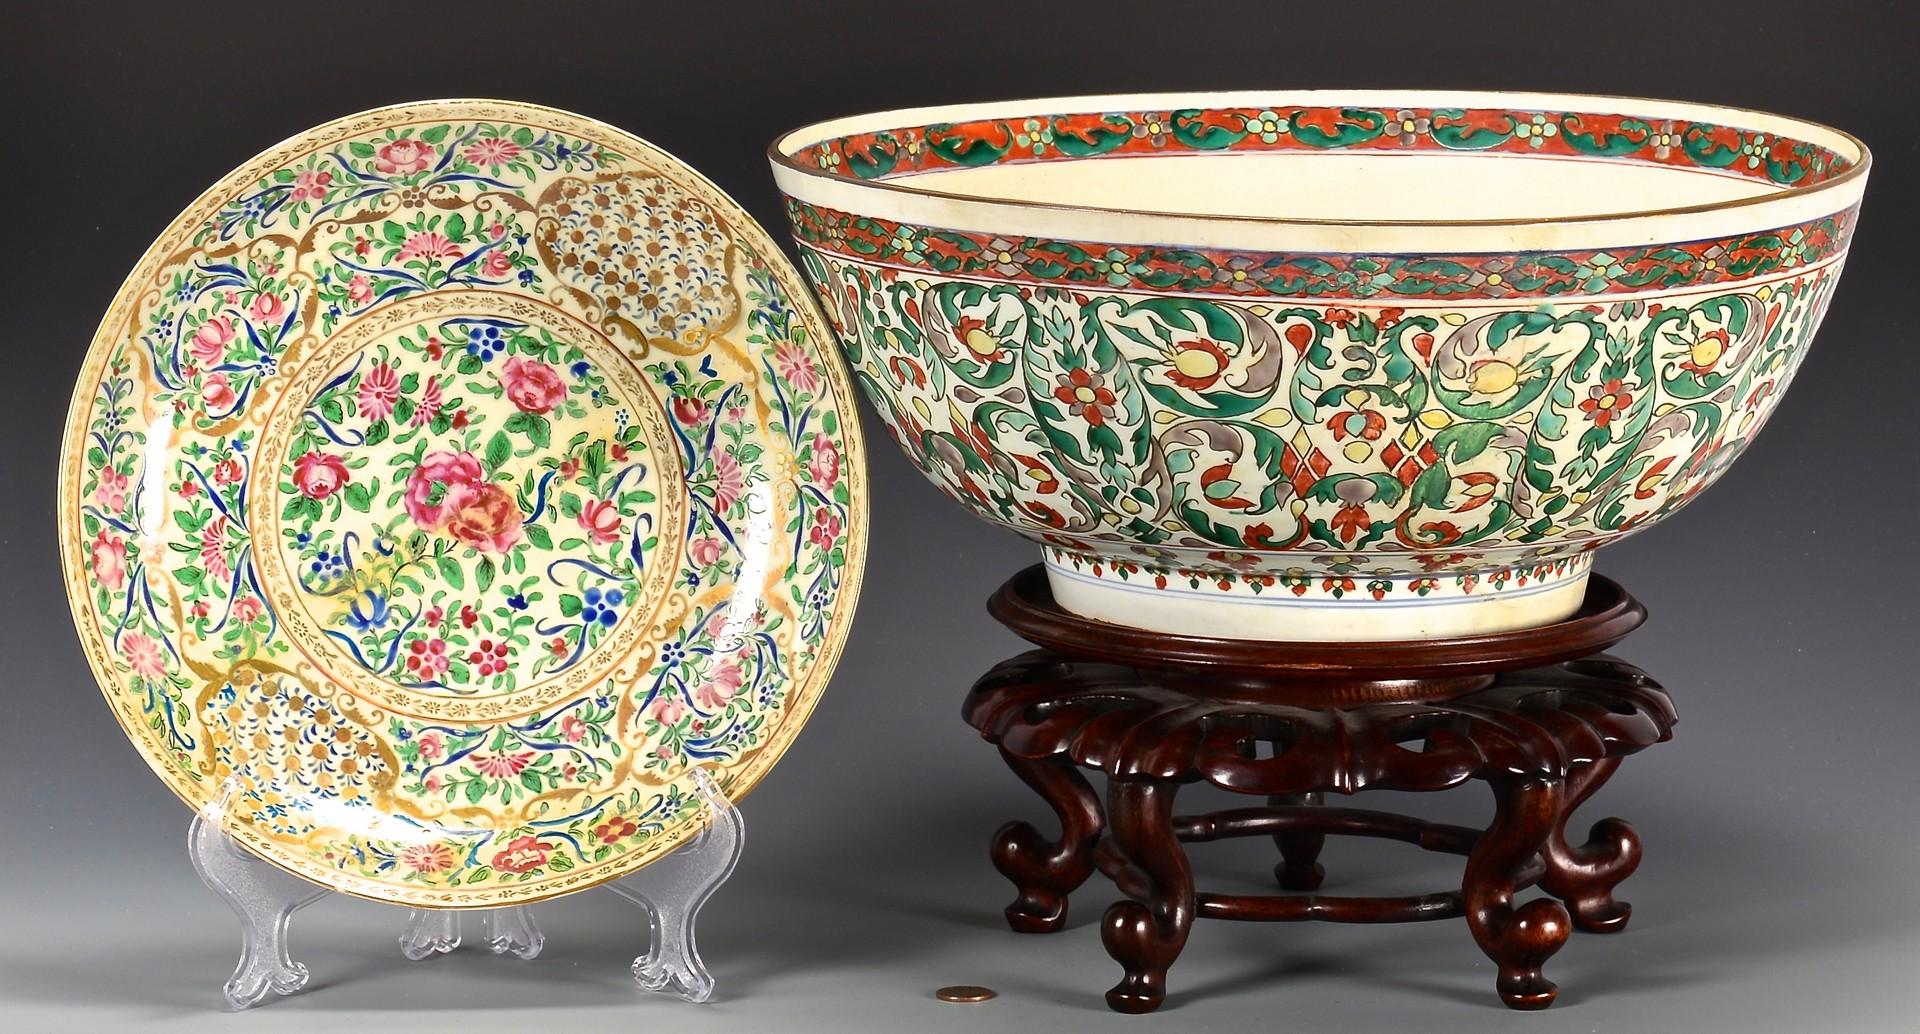 Lot 413: Porcelain Bowls & Vase, Islamic Taste